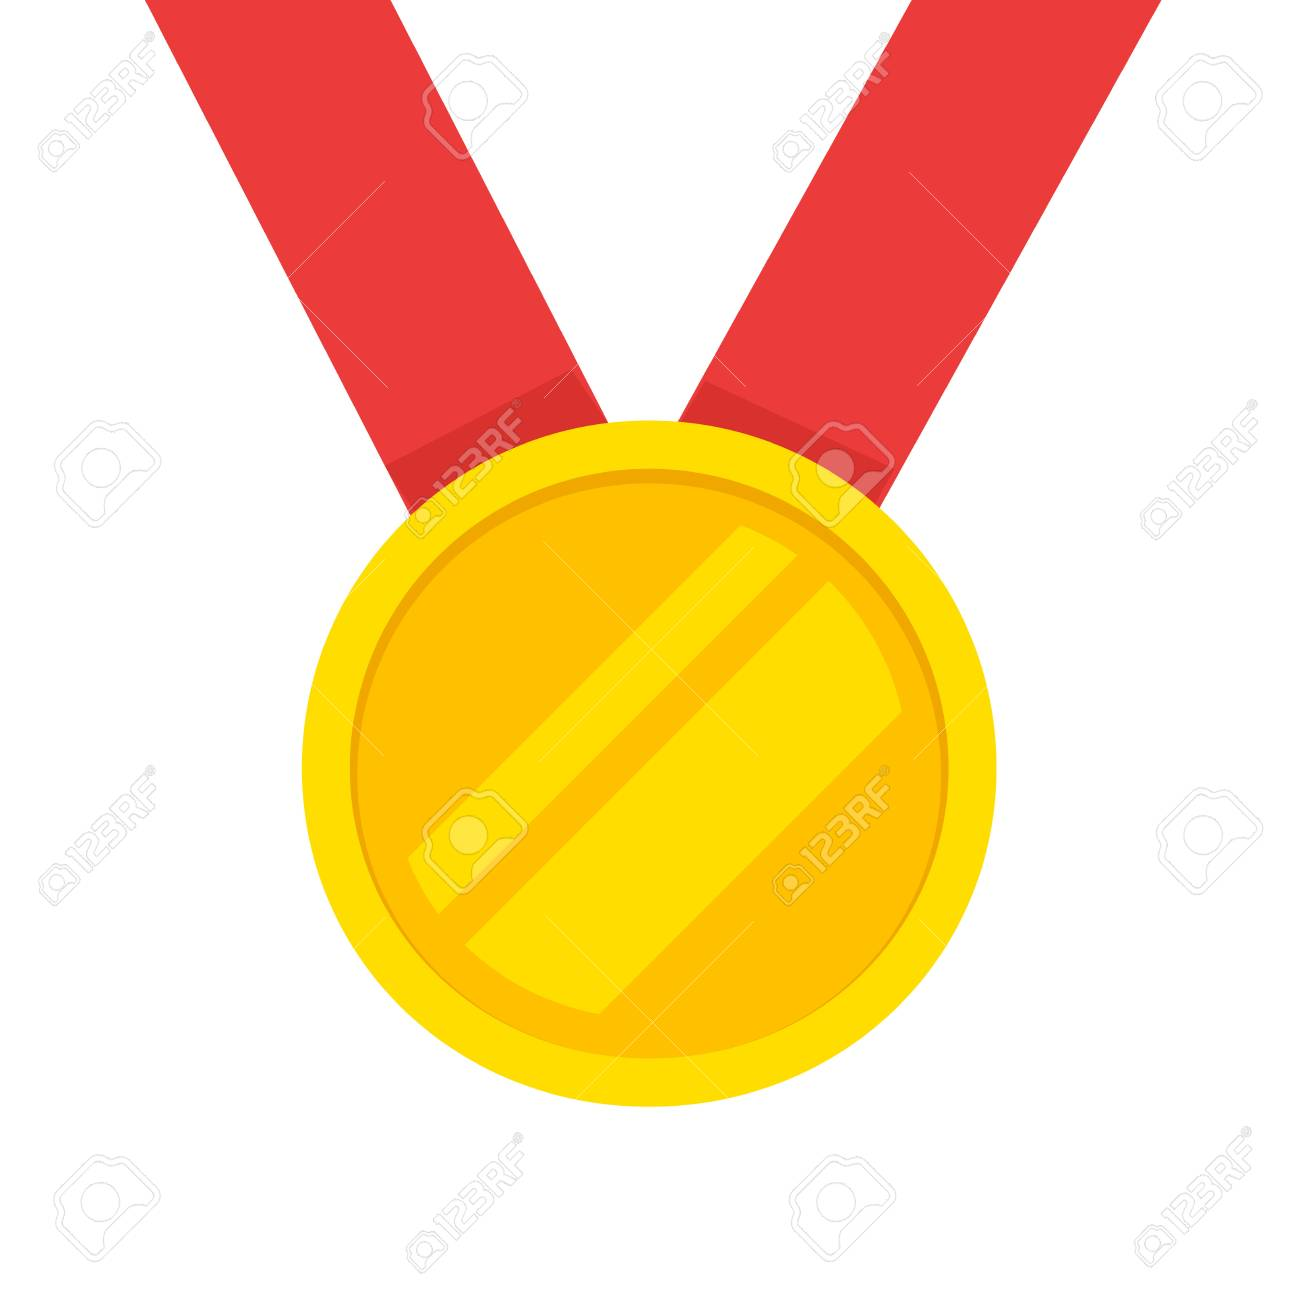 Image result for gold medal cartoon